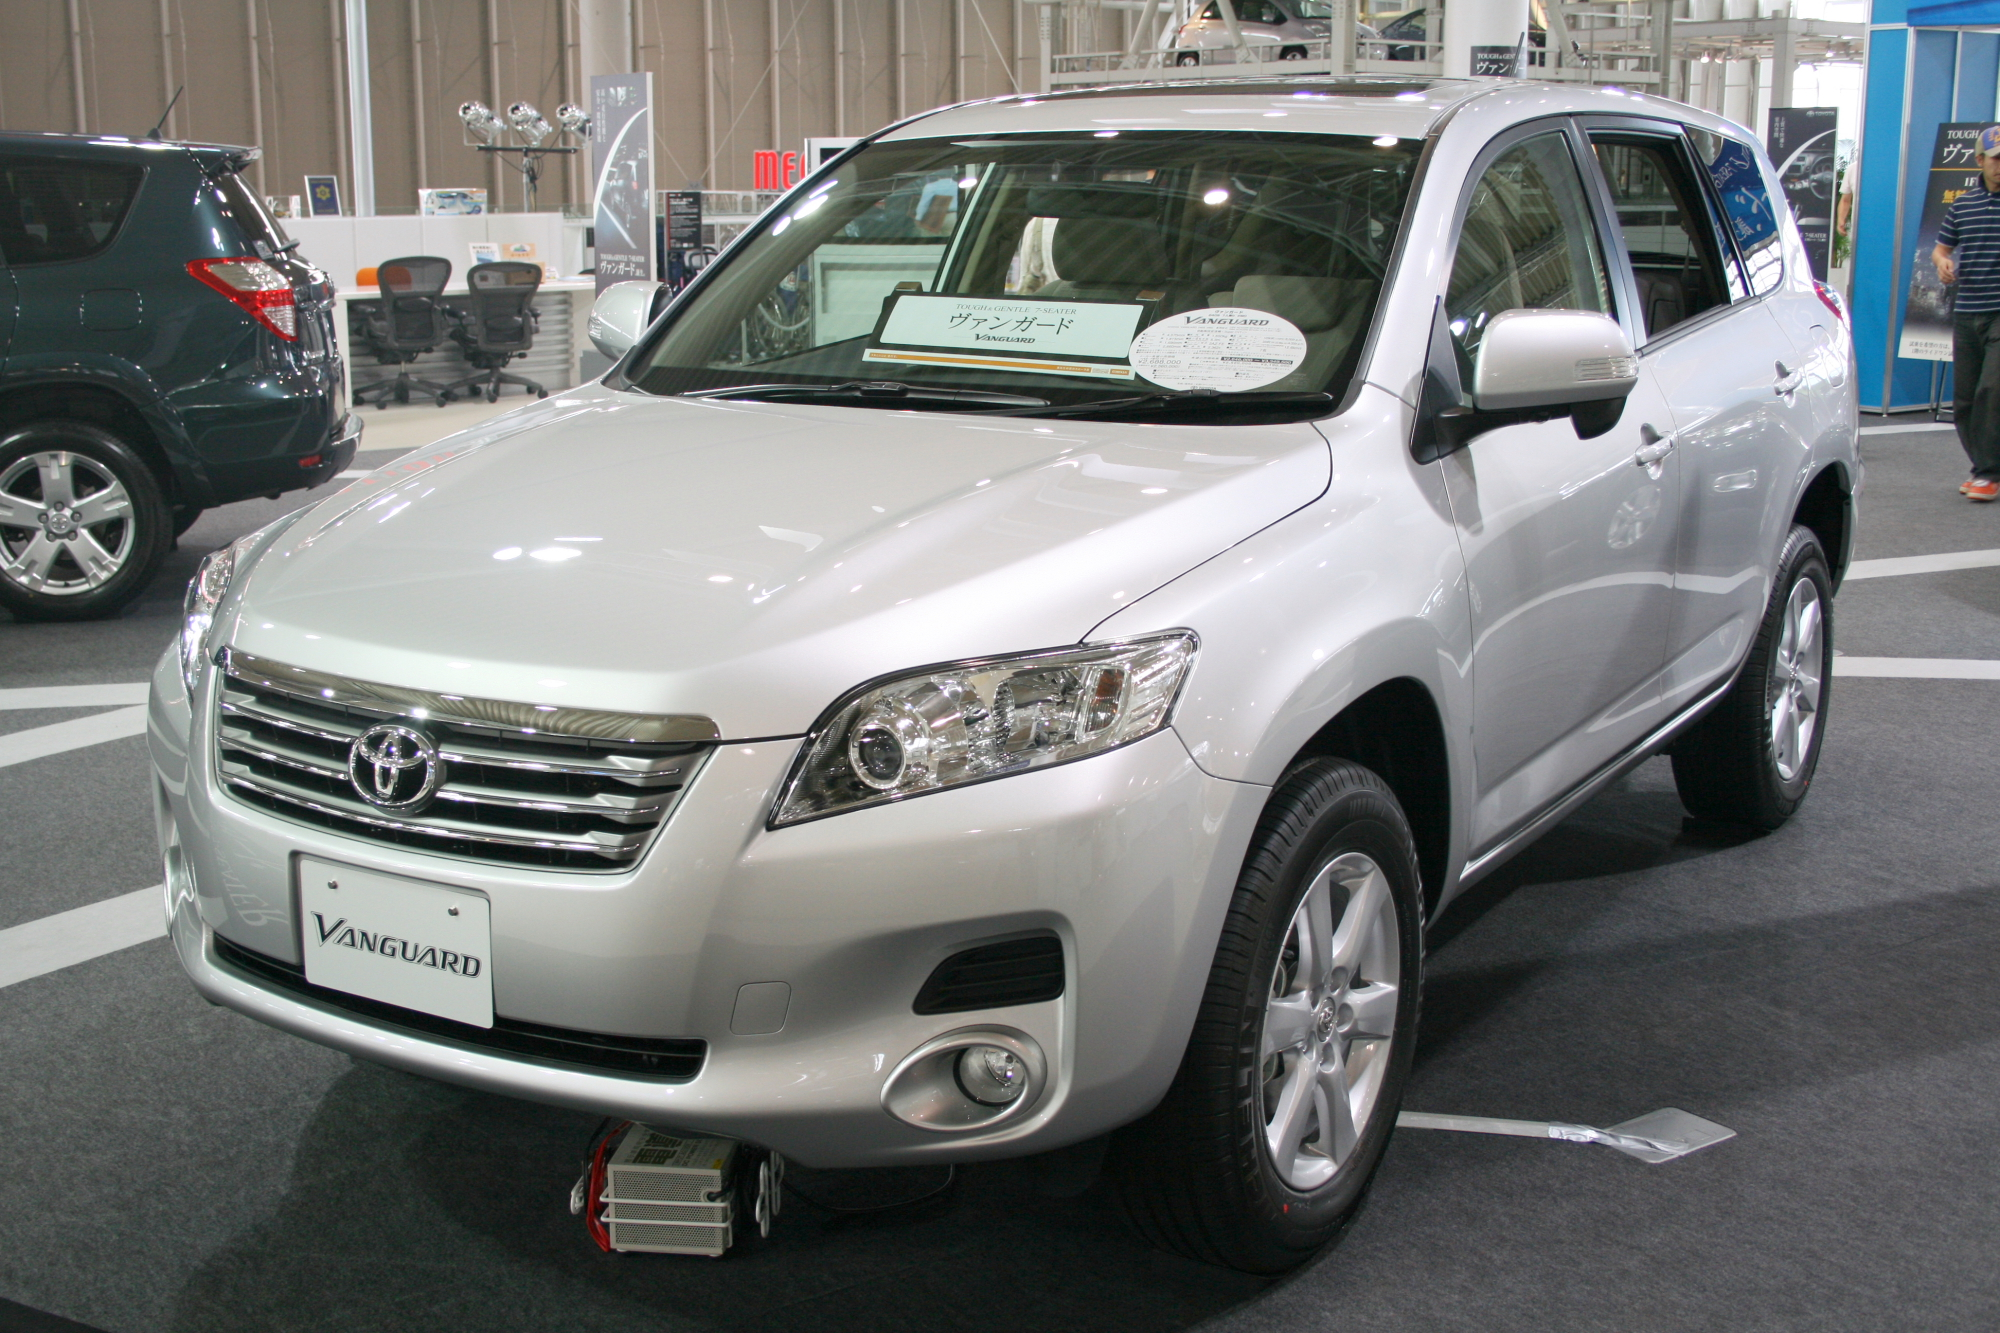 File Toyota Vanguard Jpg Wikimedia Commons